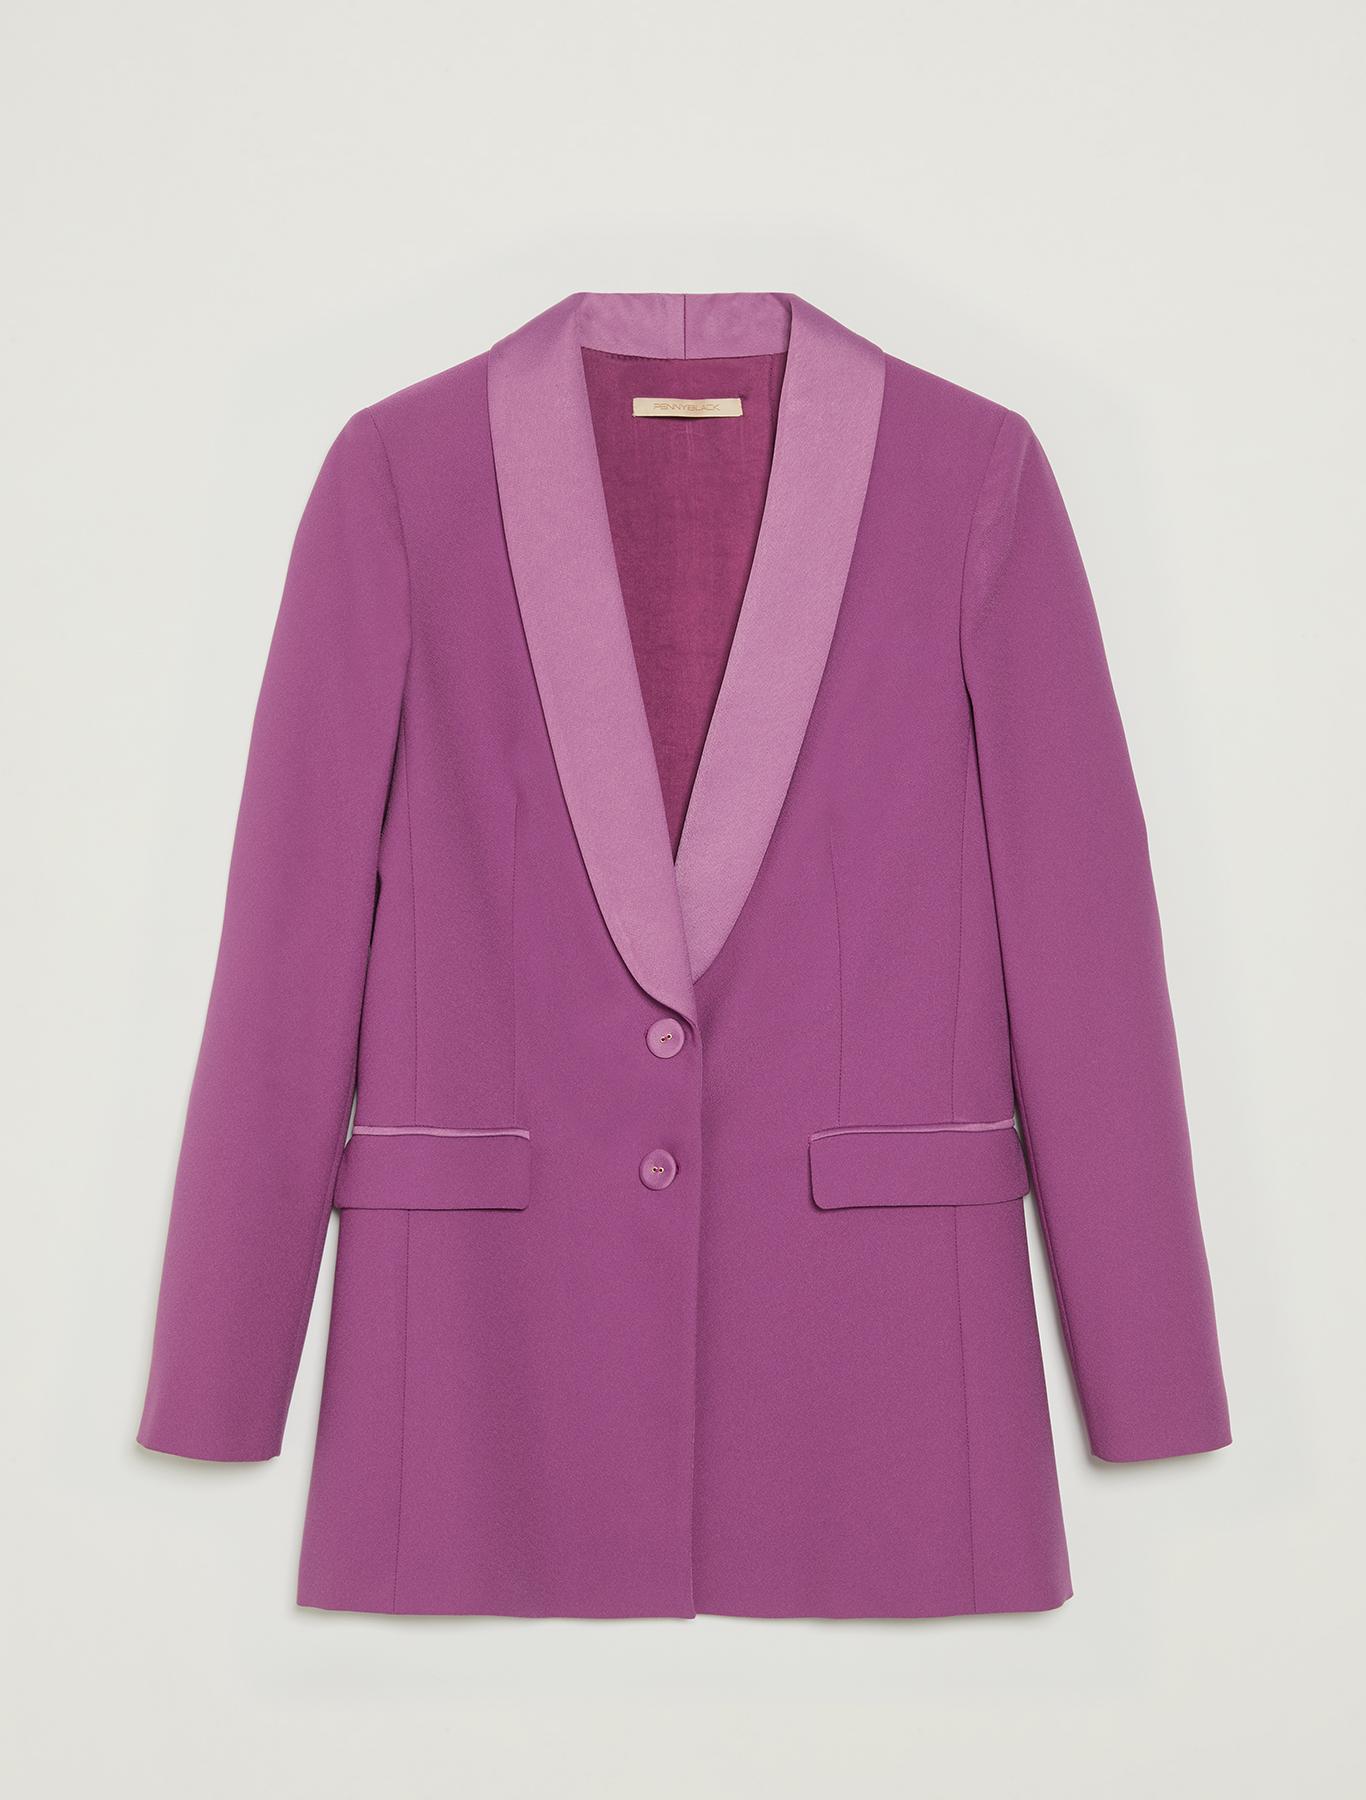 Blazer tuxedo con revers in raso - viola - pennyblack